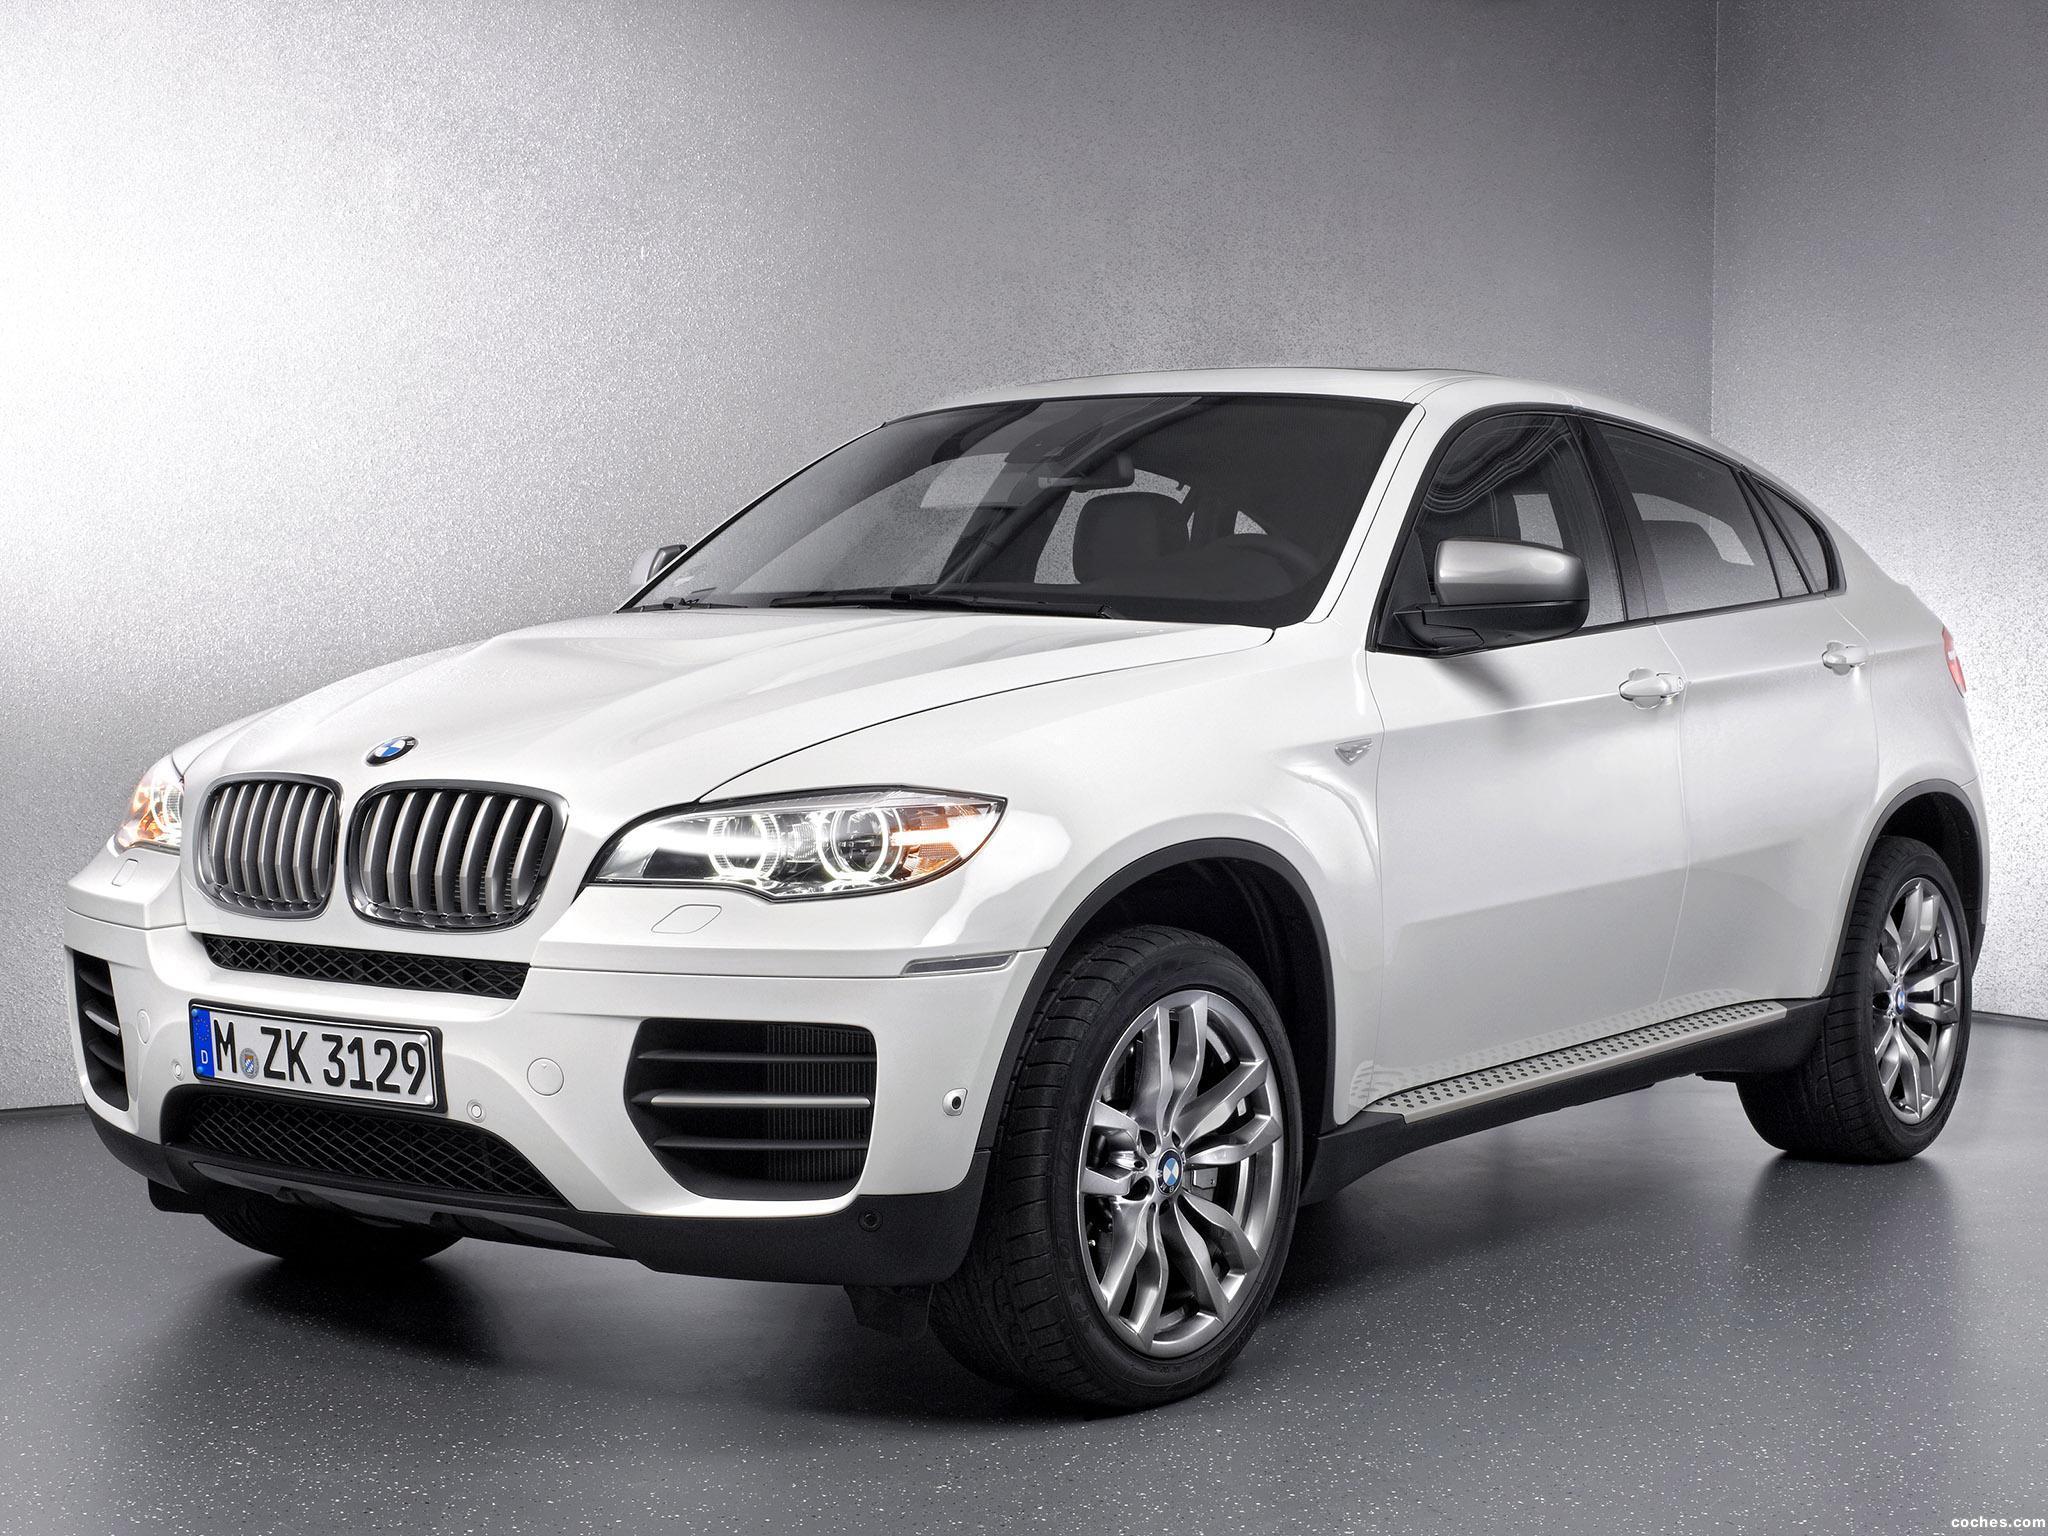 Foto 0 de BMW X6 M50d 2012